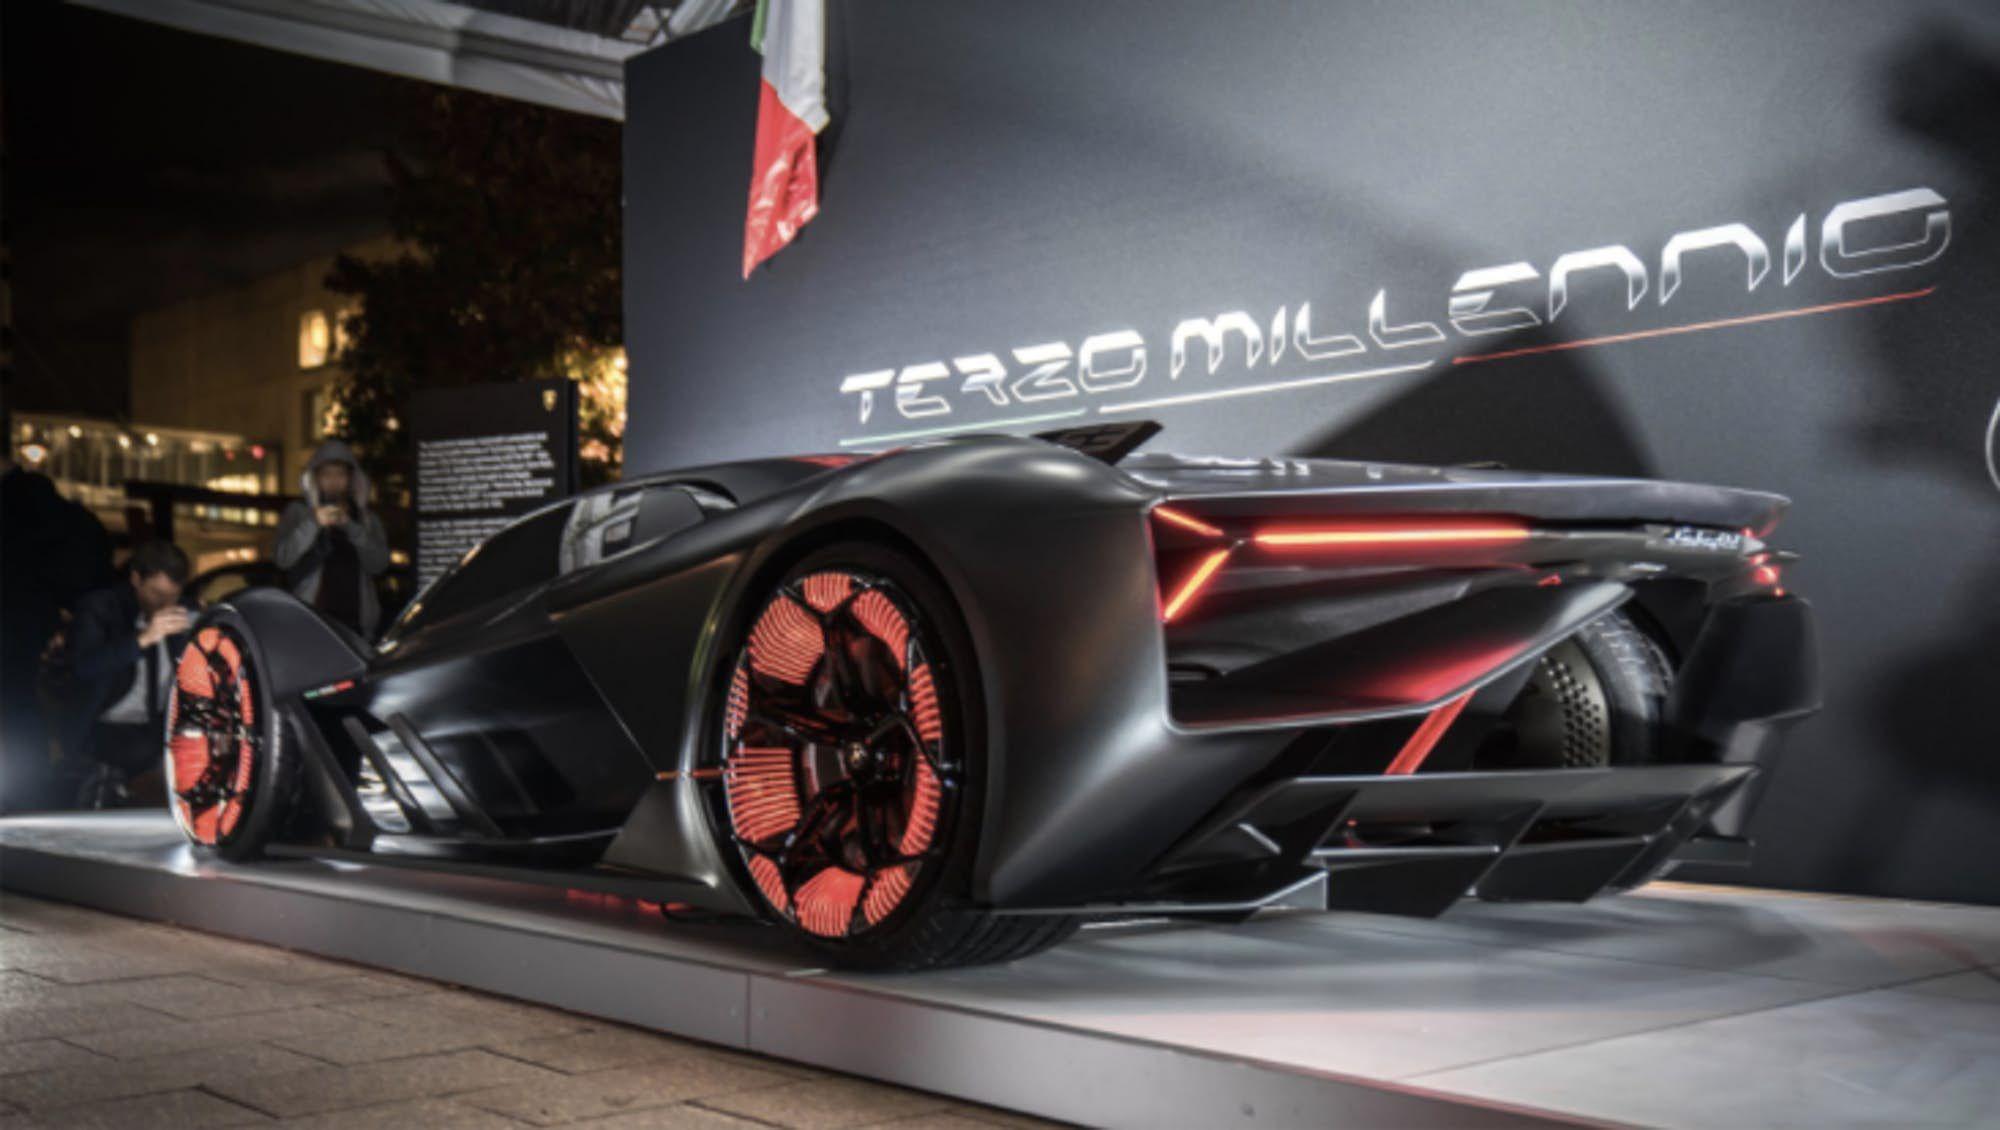 Lamborghini Sets Sights On Electrified Future With Terzo Millennio Concept Lamborghini Lamborghini Pictures Sports Car